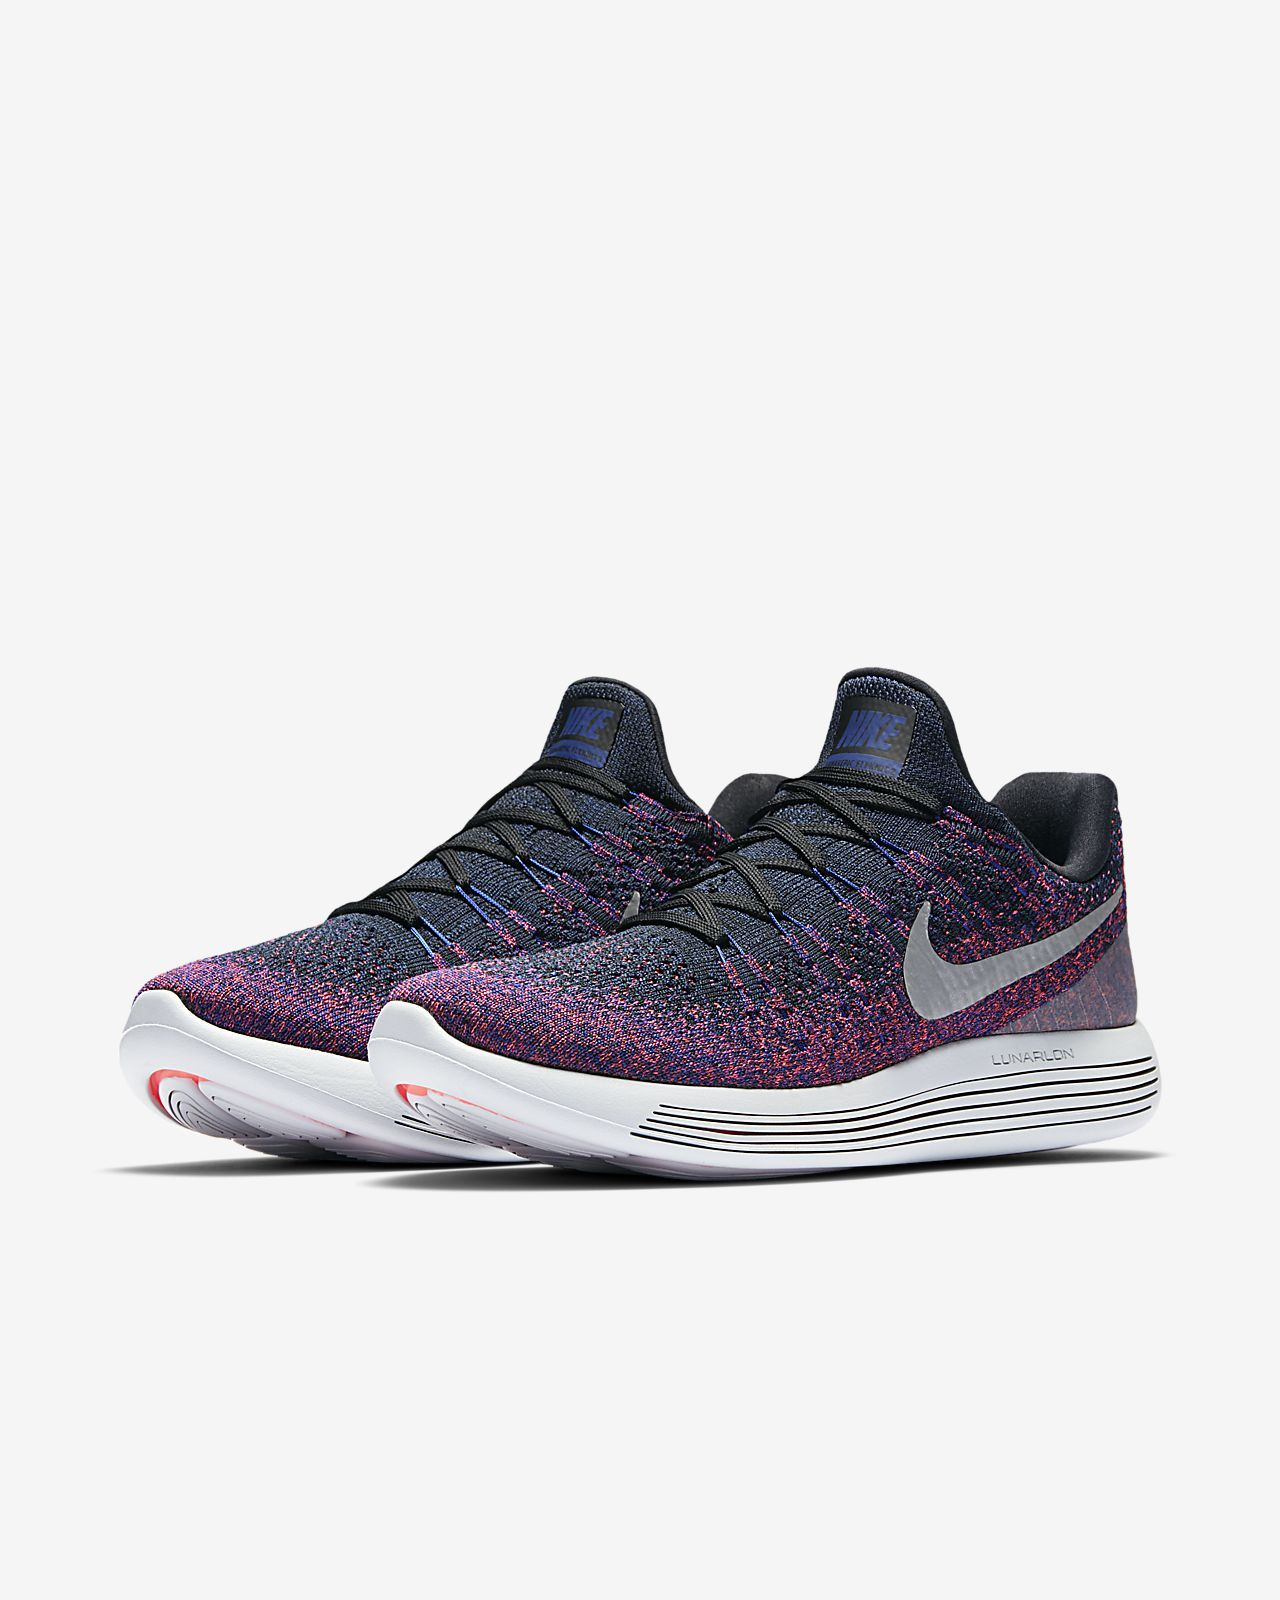 sports shoes 8abe5 169bd Nike LunarEpic Low Flyknit 2 Men s Running Shoe